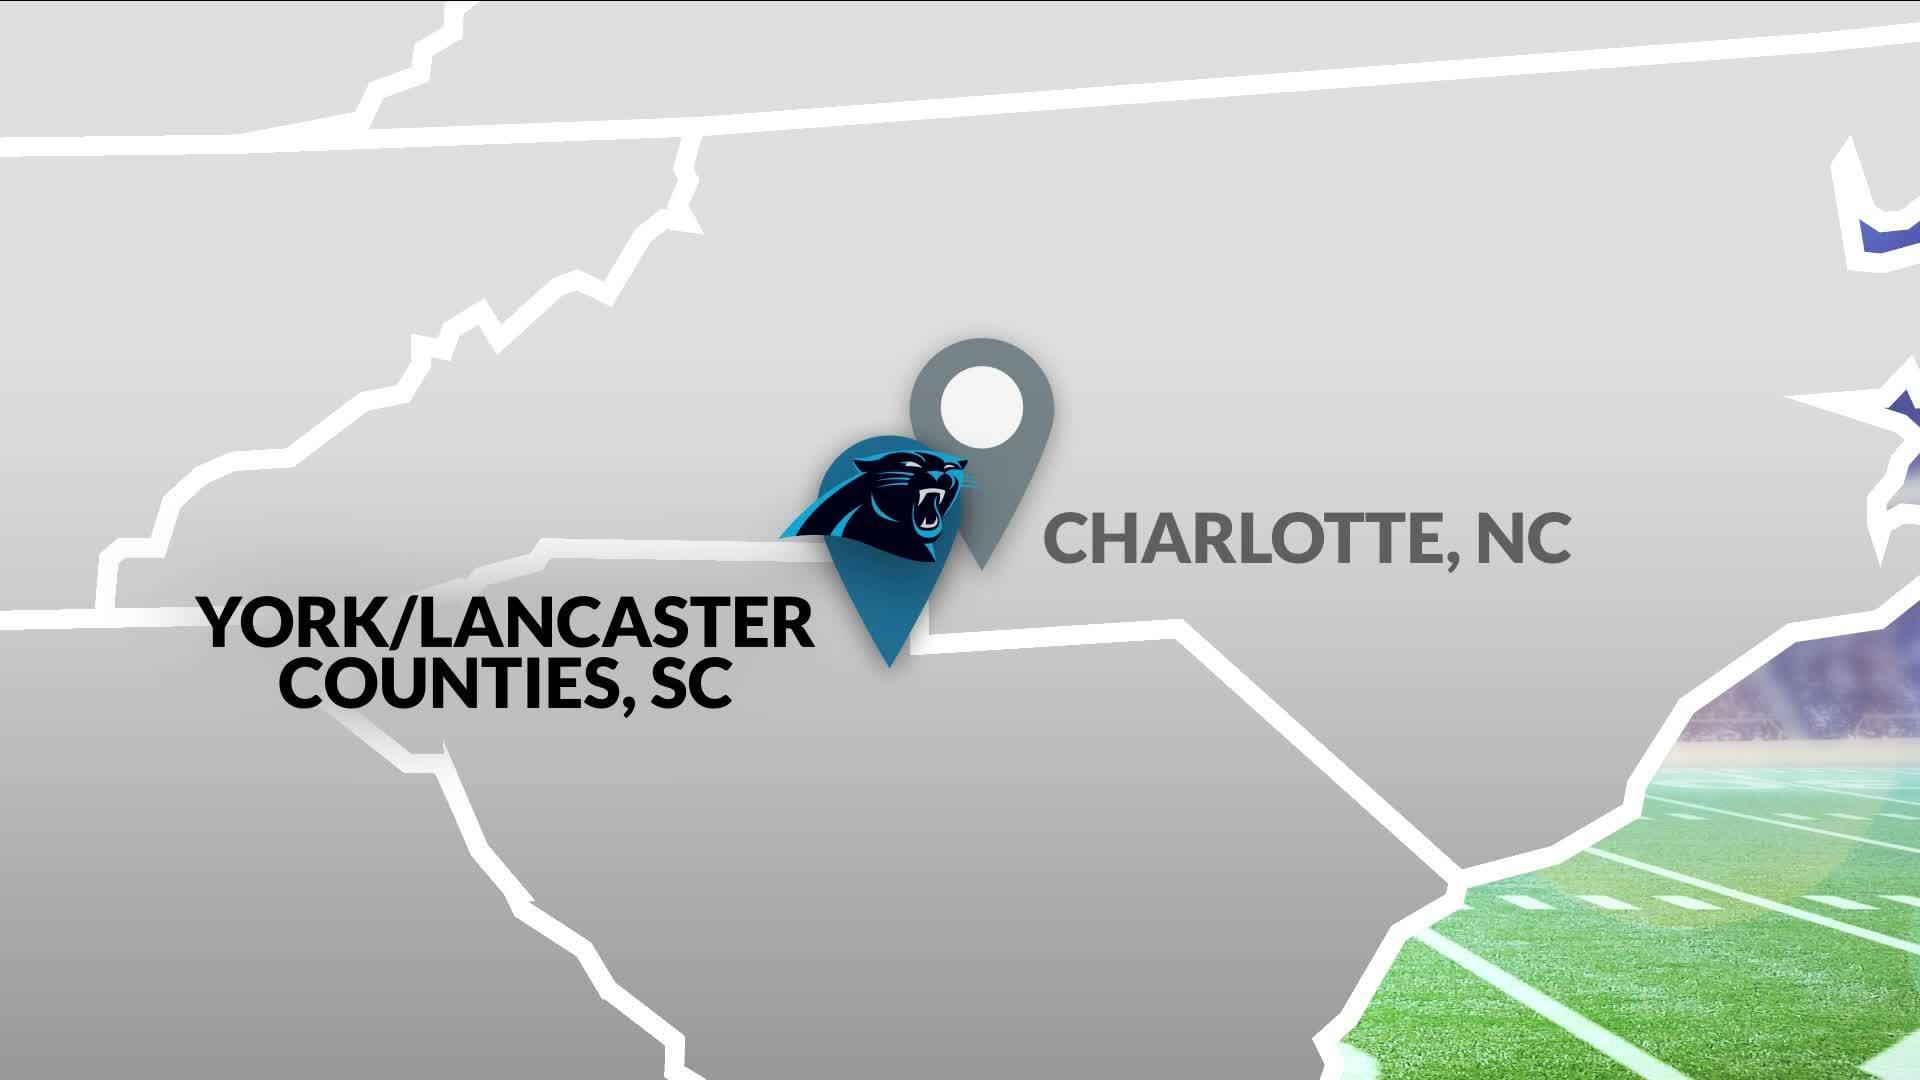 Carolina_Panthers_consider_moving_some_o_7_20190314034544